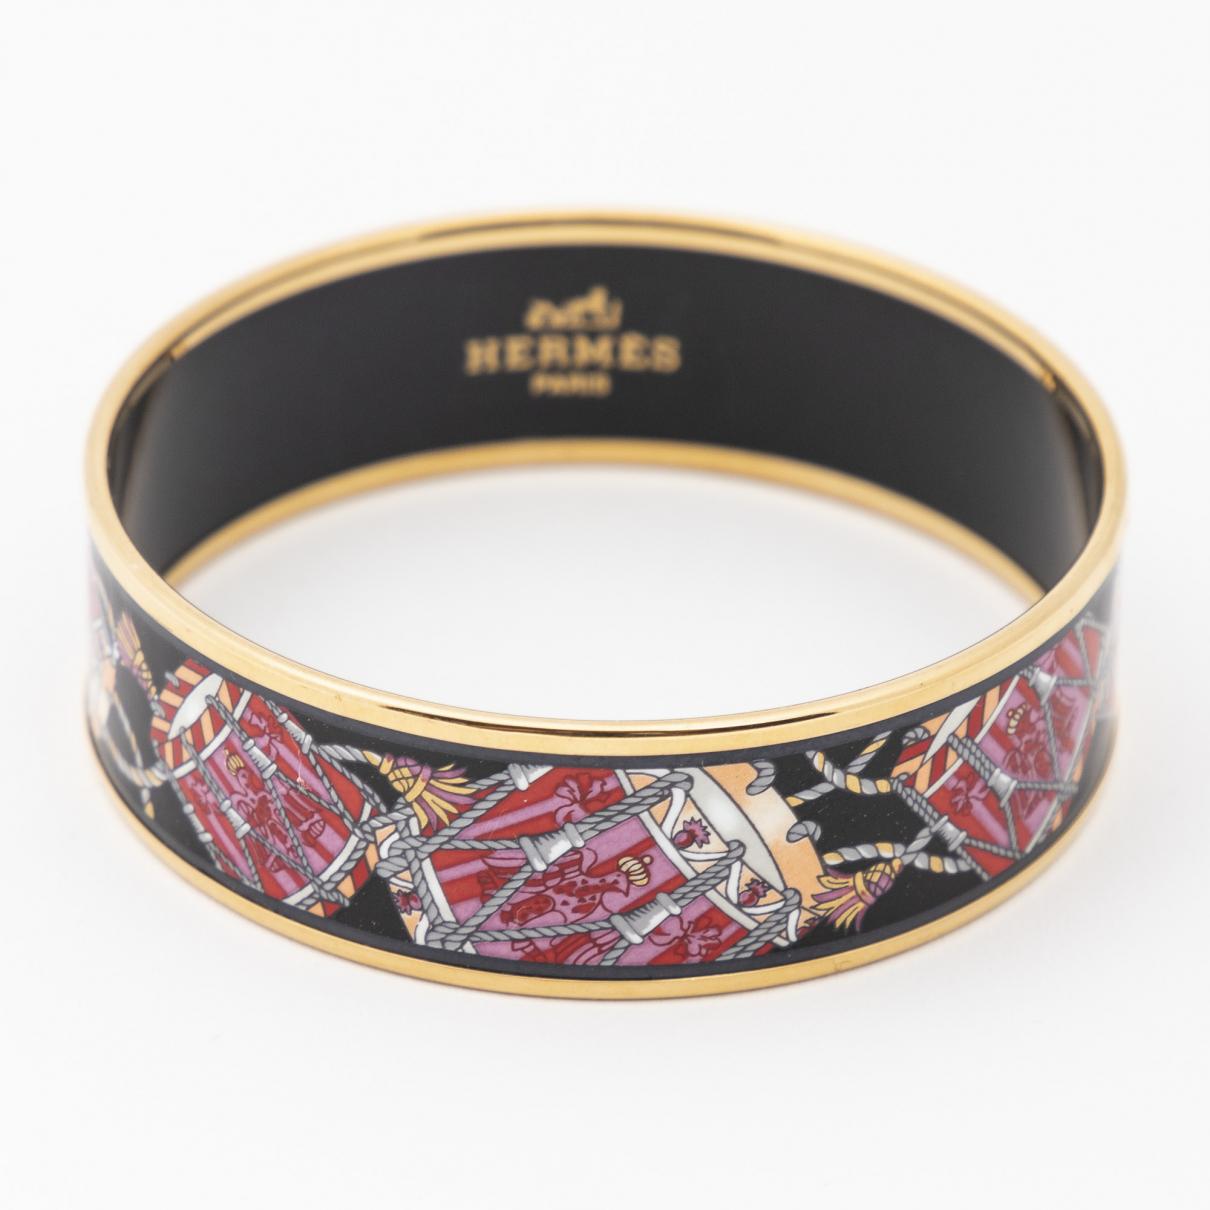 Hermes - Bracelet   pour femme en or jaune - noir